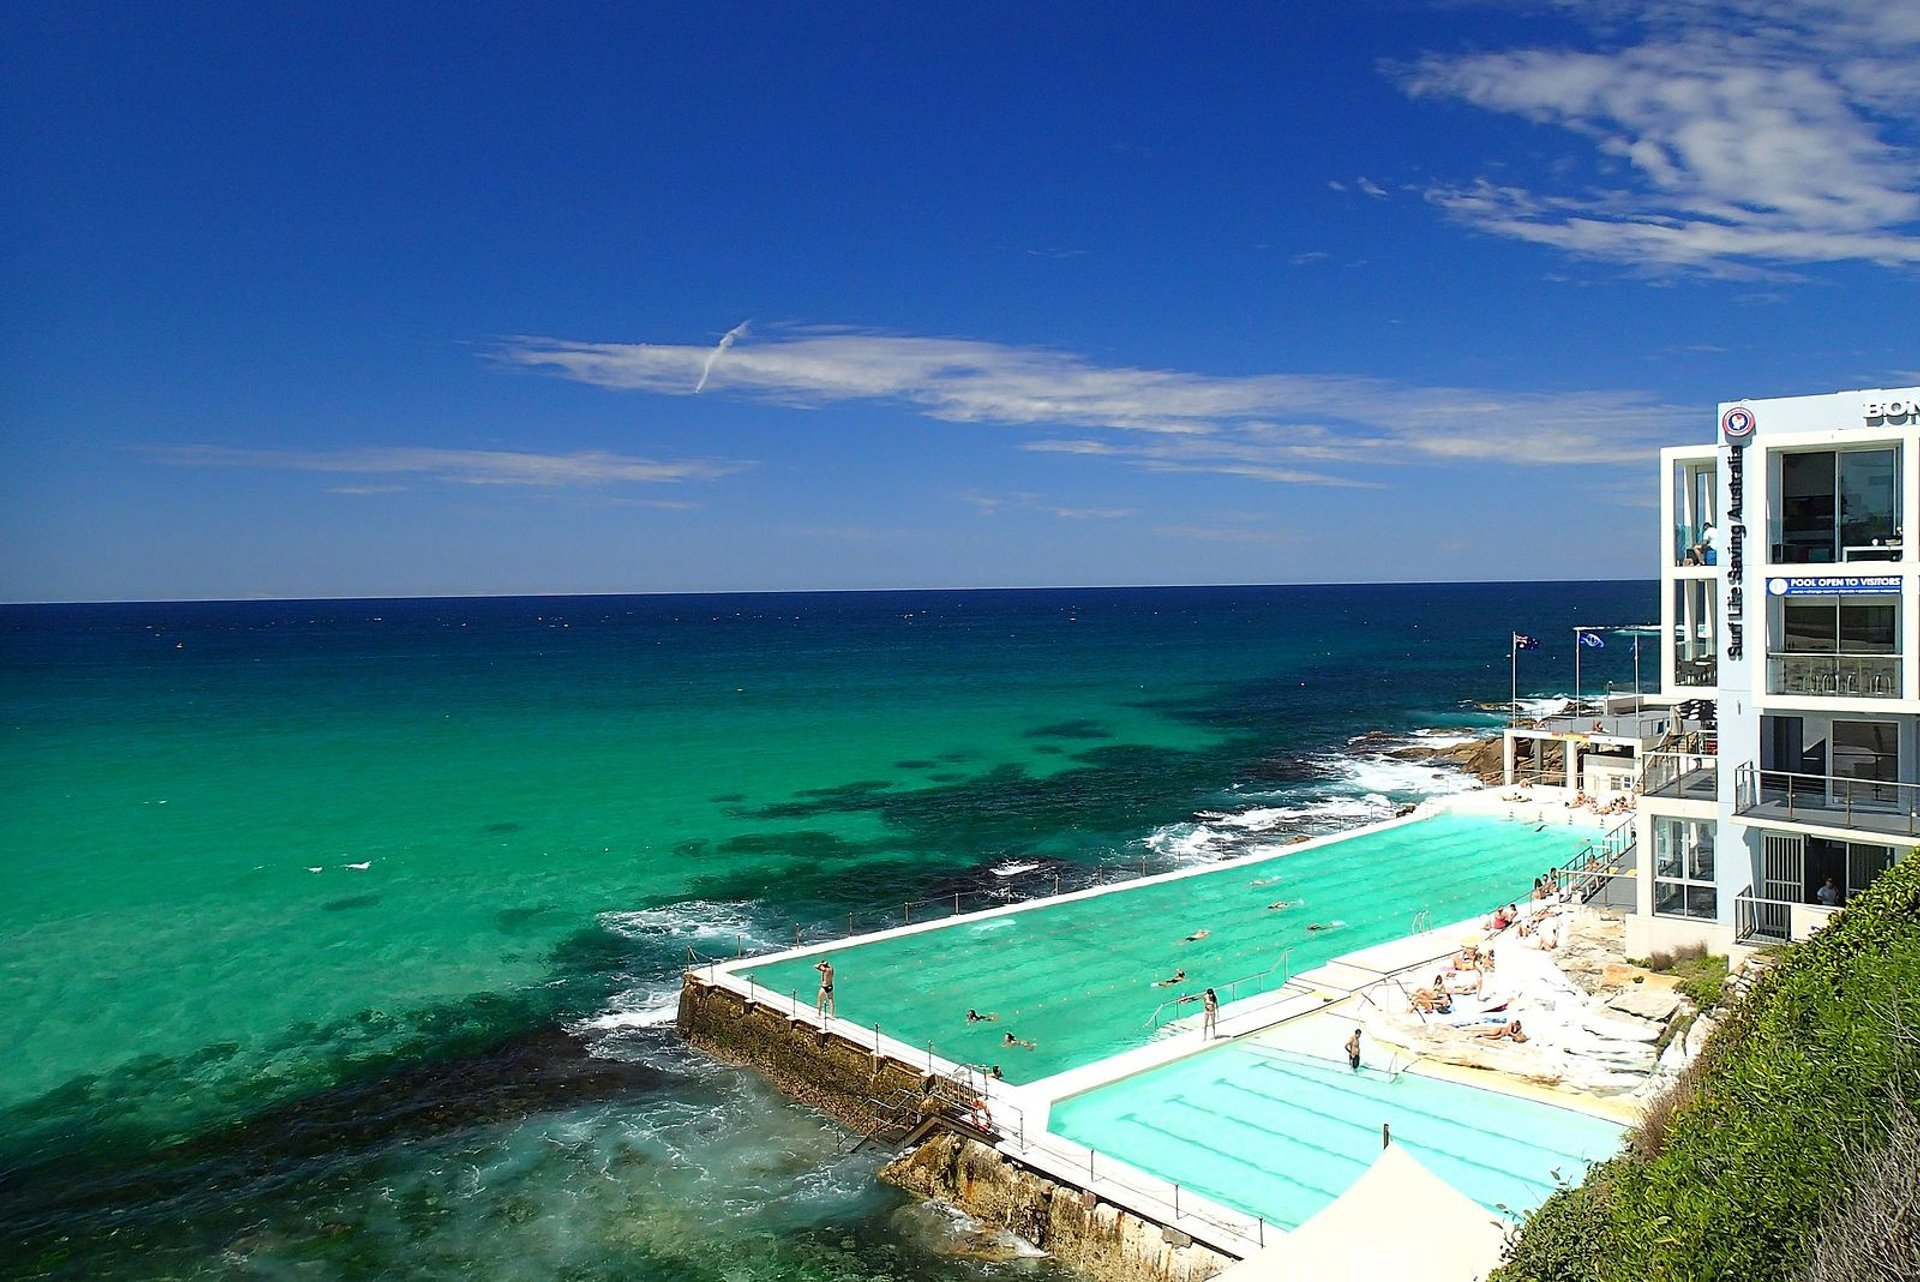 Bondi Icebergs Pool in Sydney 2020 - Best Time